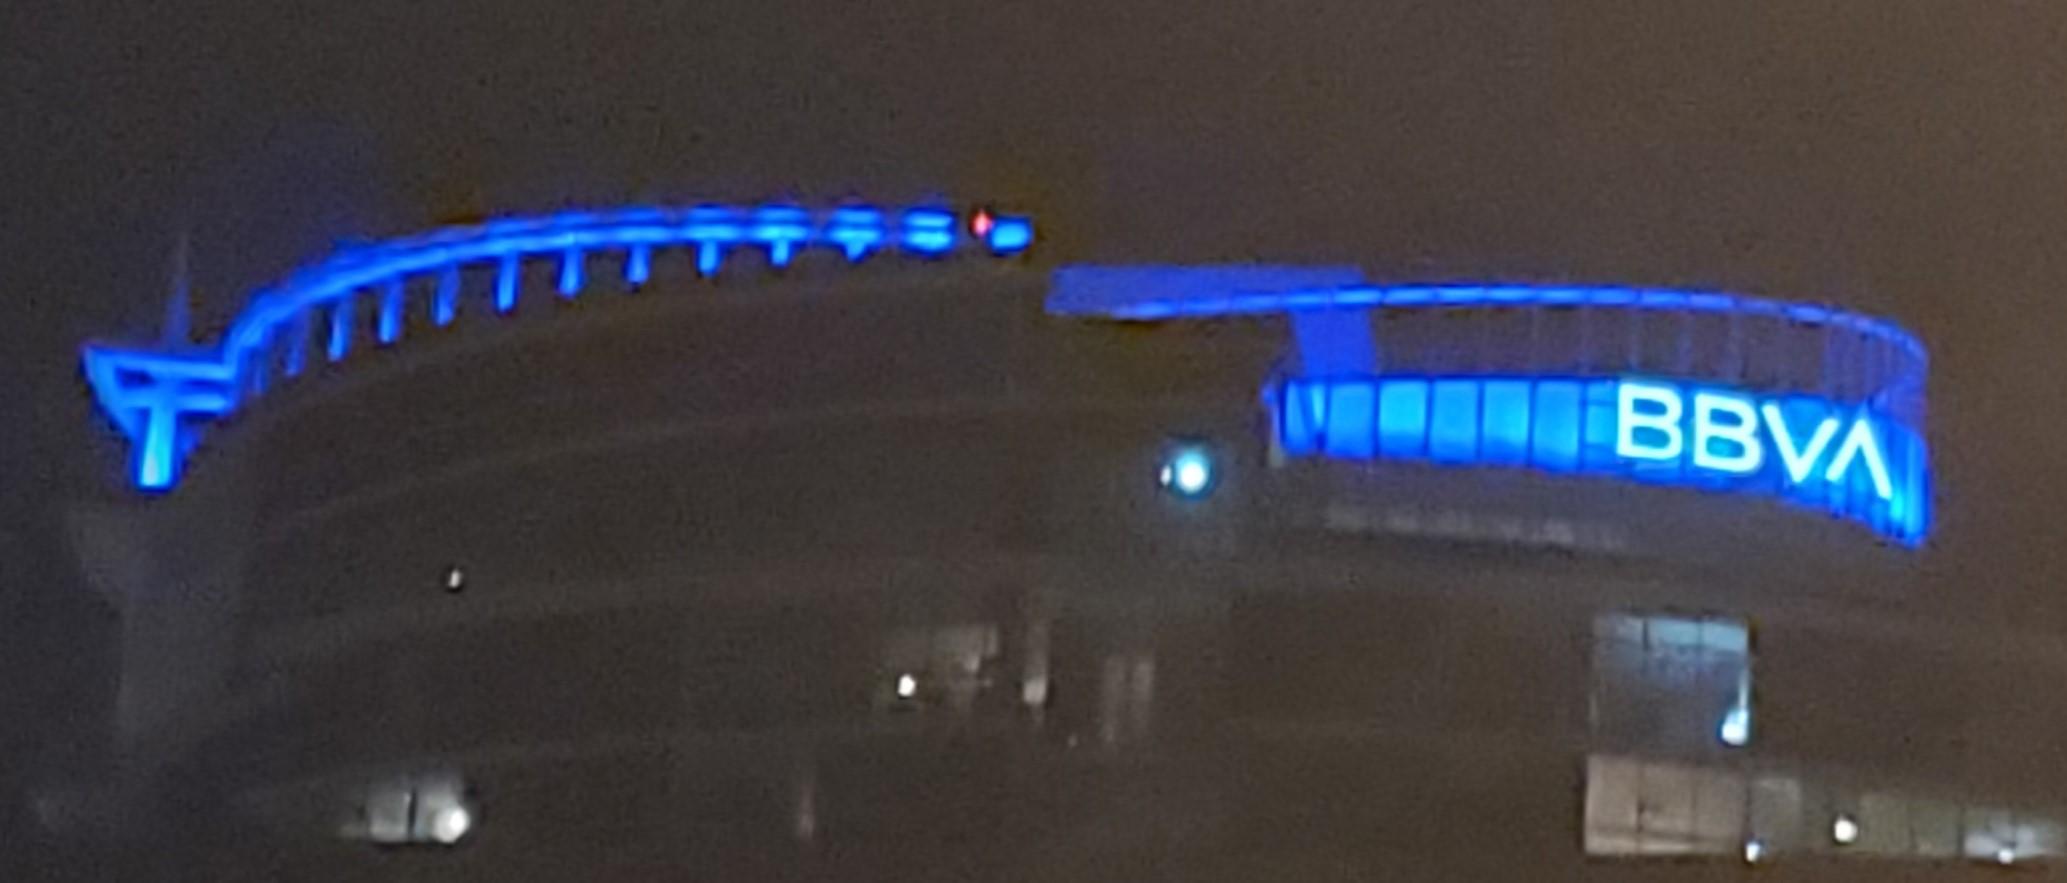 BBVA-Building-Orlando-Paint-The-Town-Blue-2021-FBITCAAA